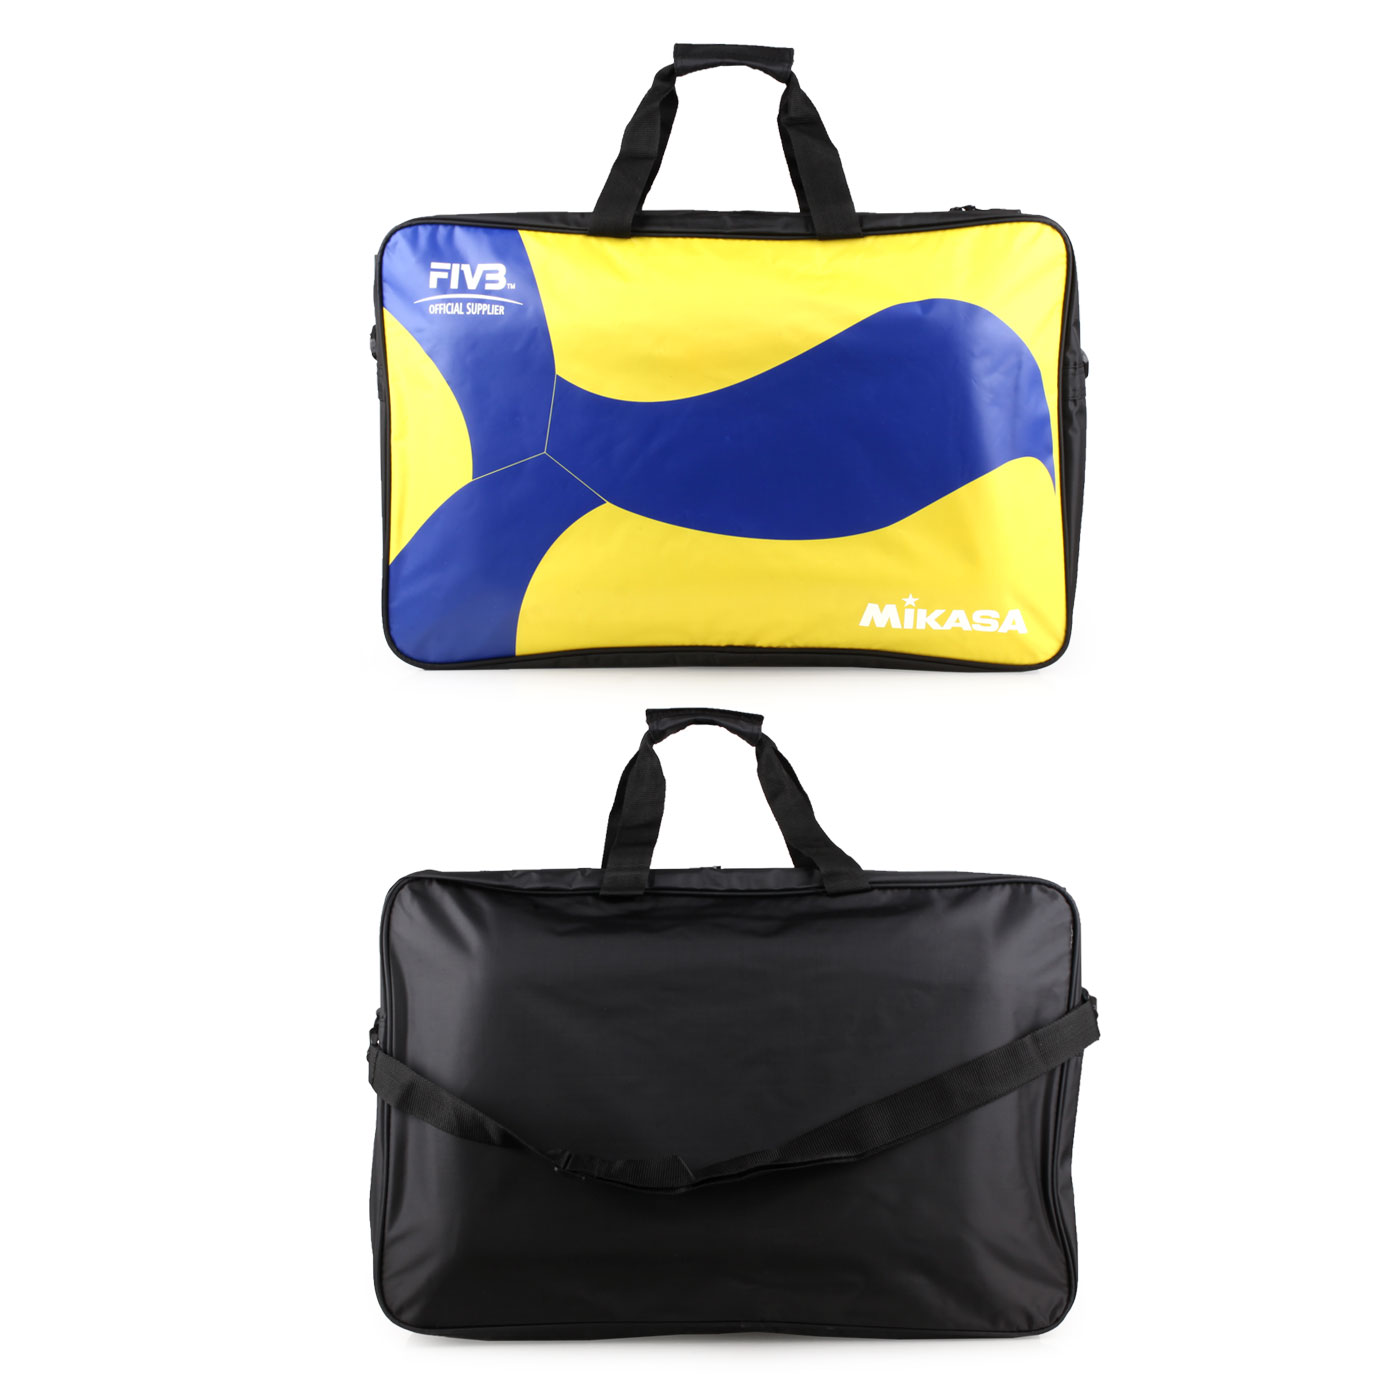 MIKASA 排球袋(6顆裝) MKAC-BG260W-YB - 藍黃黑